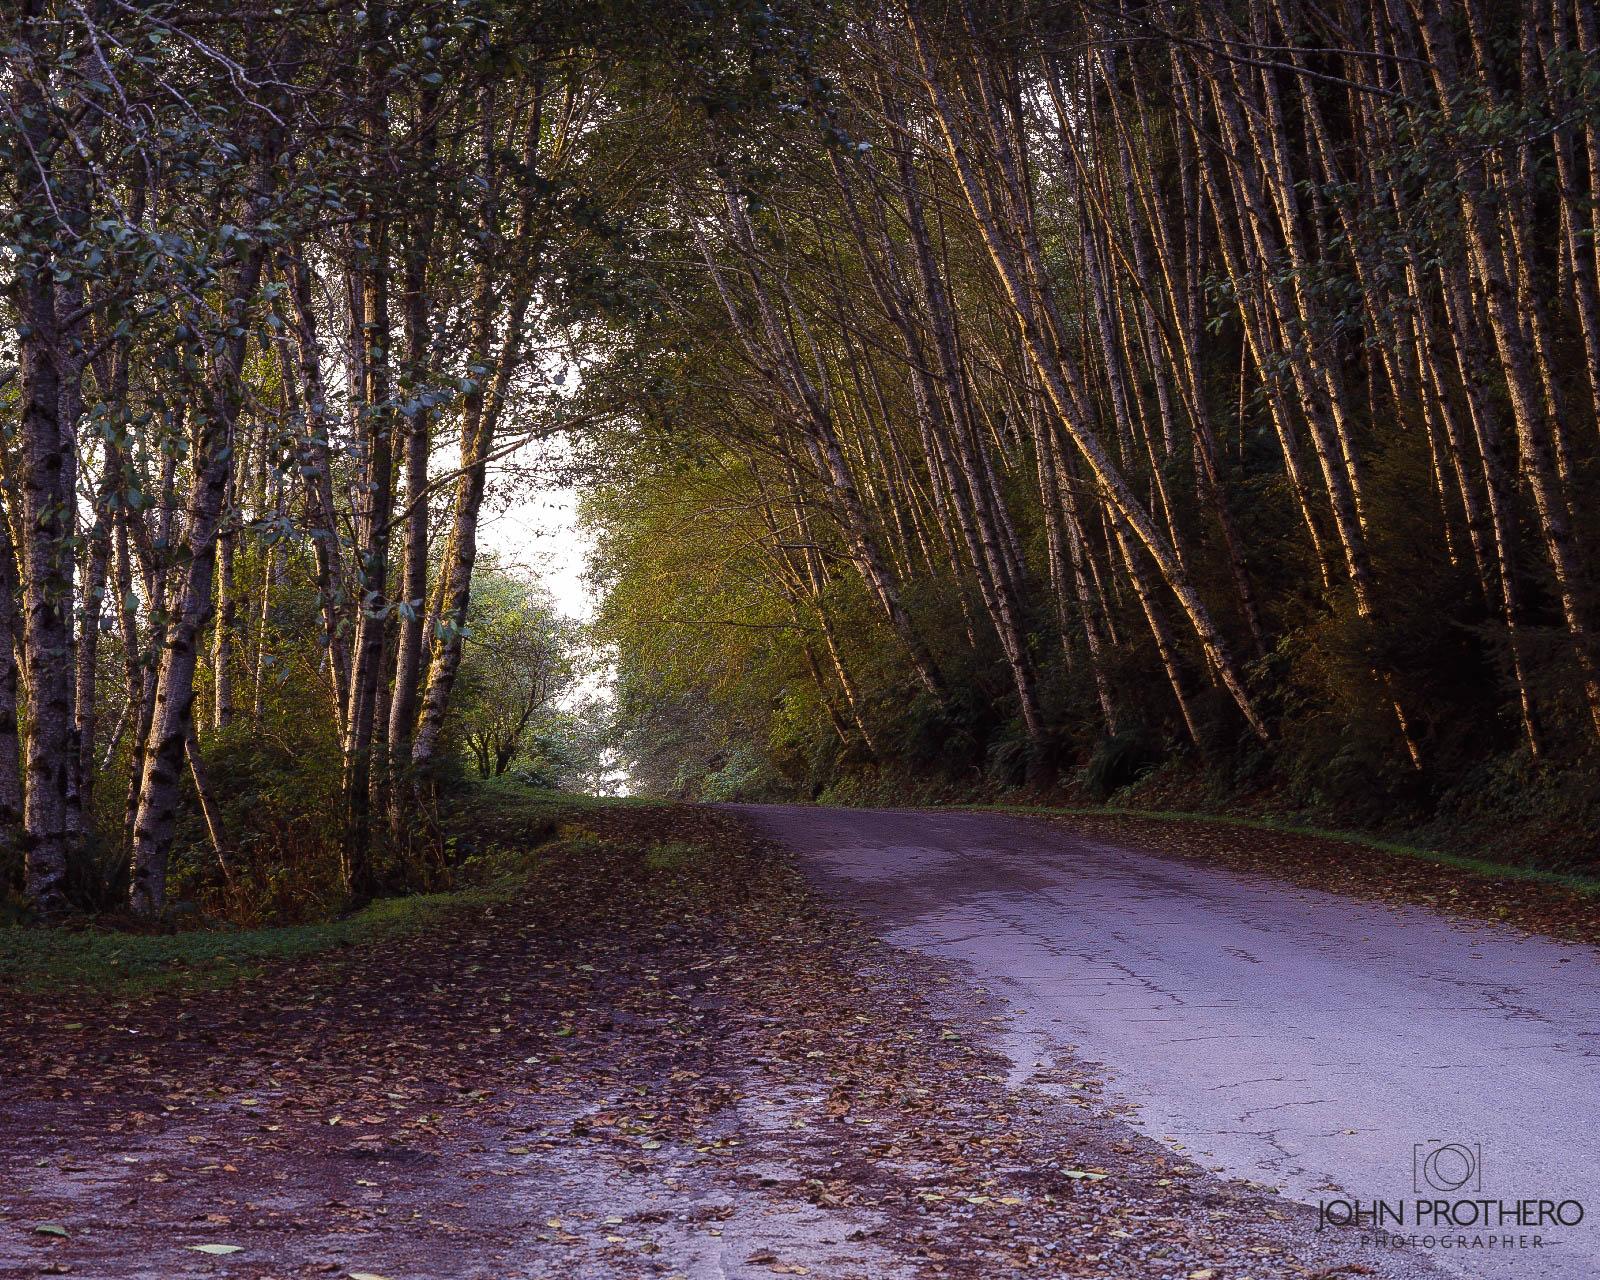 "Coastal Drive, Prairie Creek Redwoods State Park / John Prothero / Zone VI 4x5"" view camera"